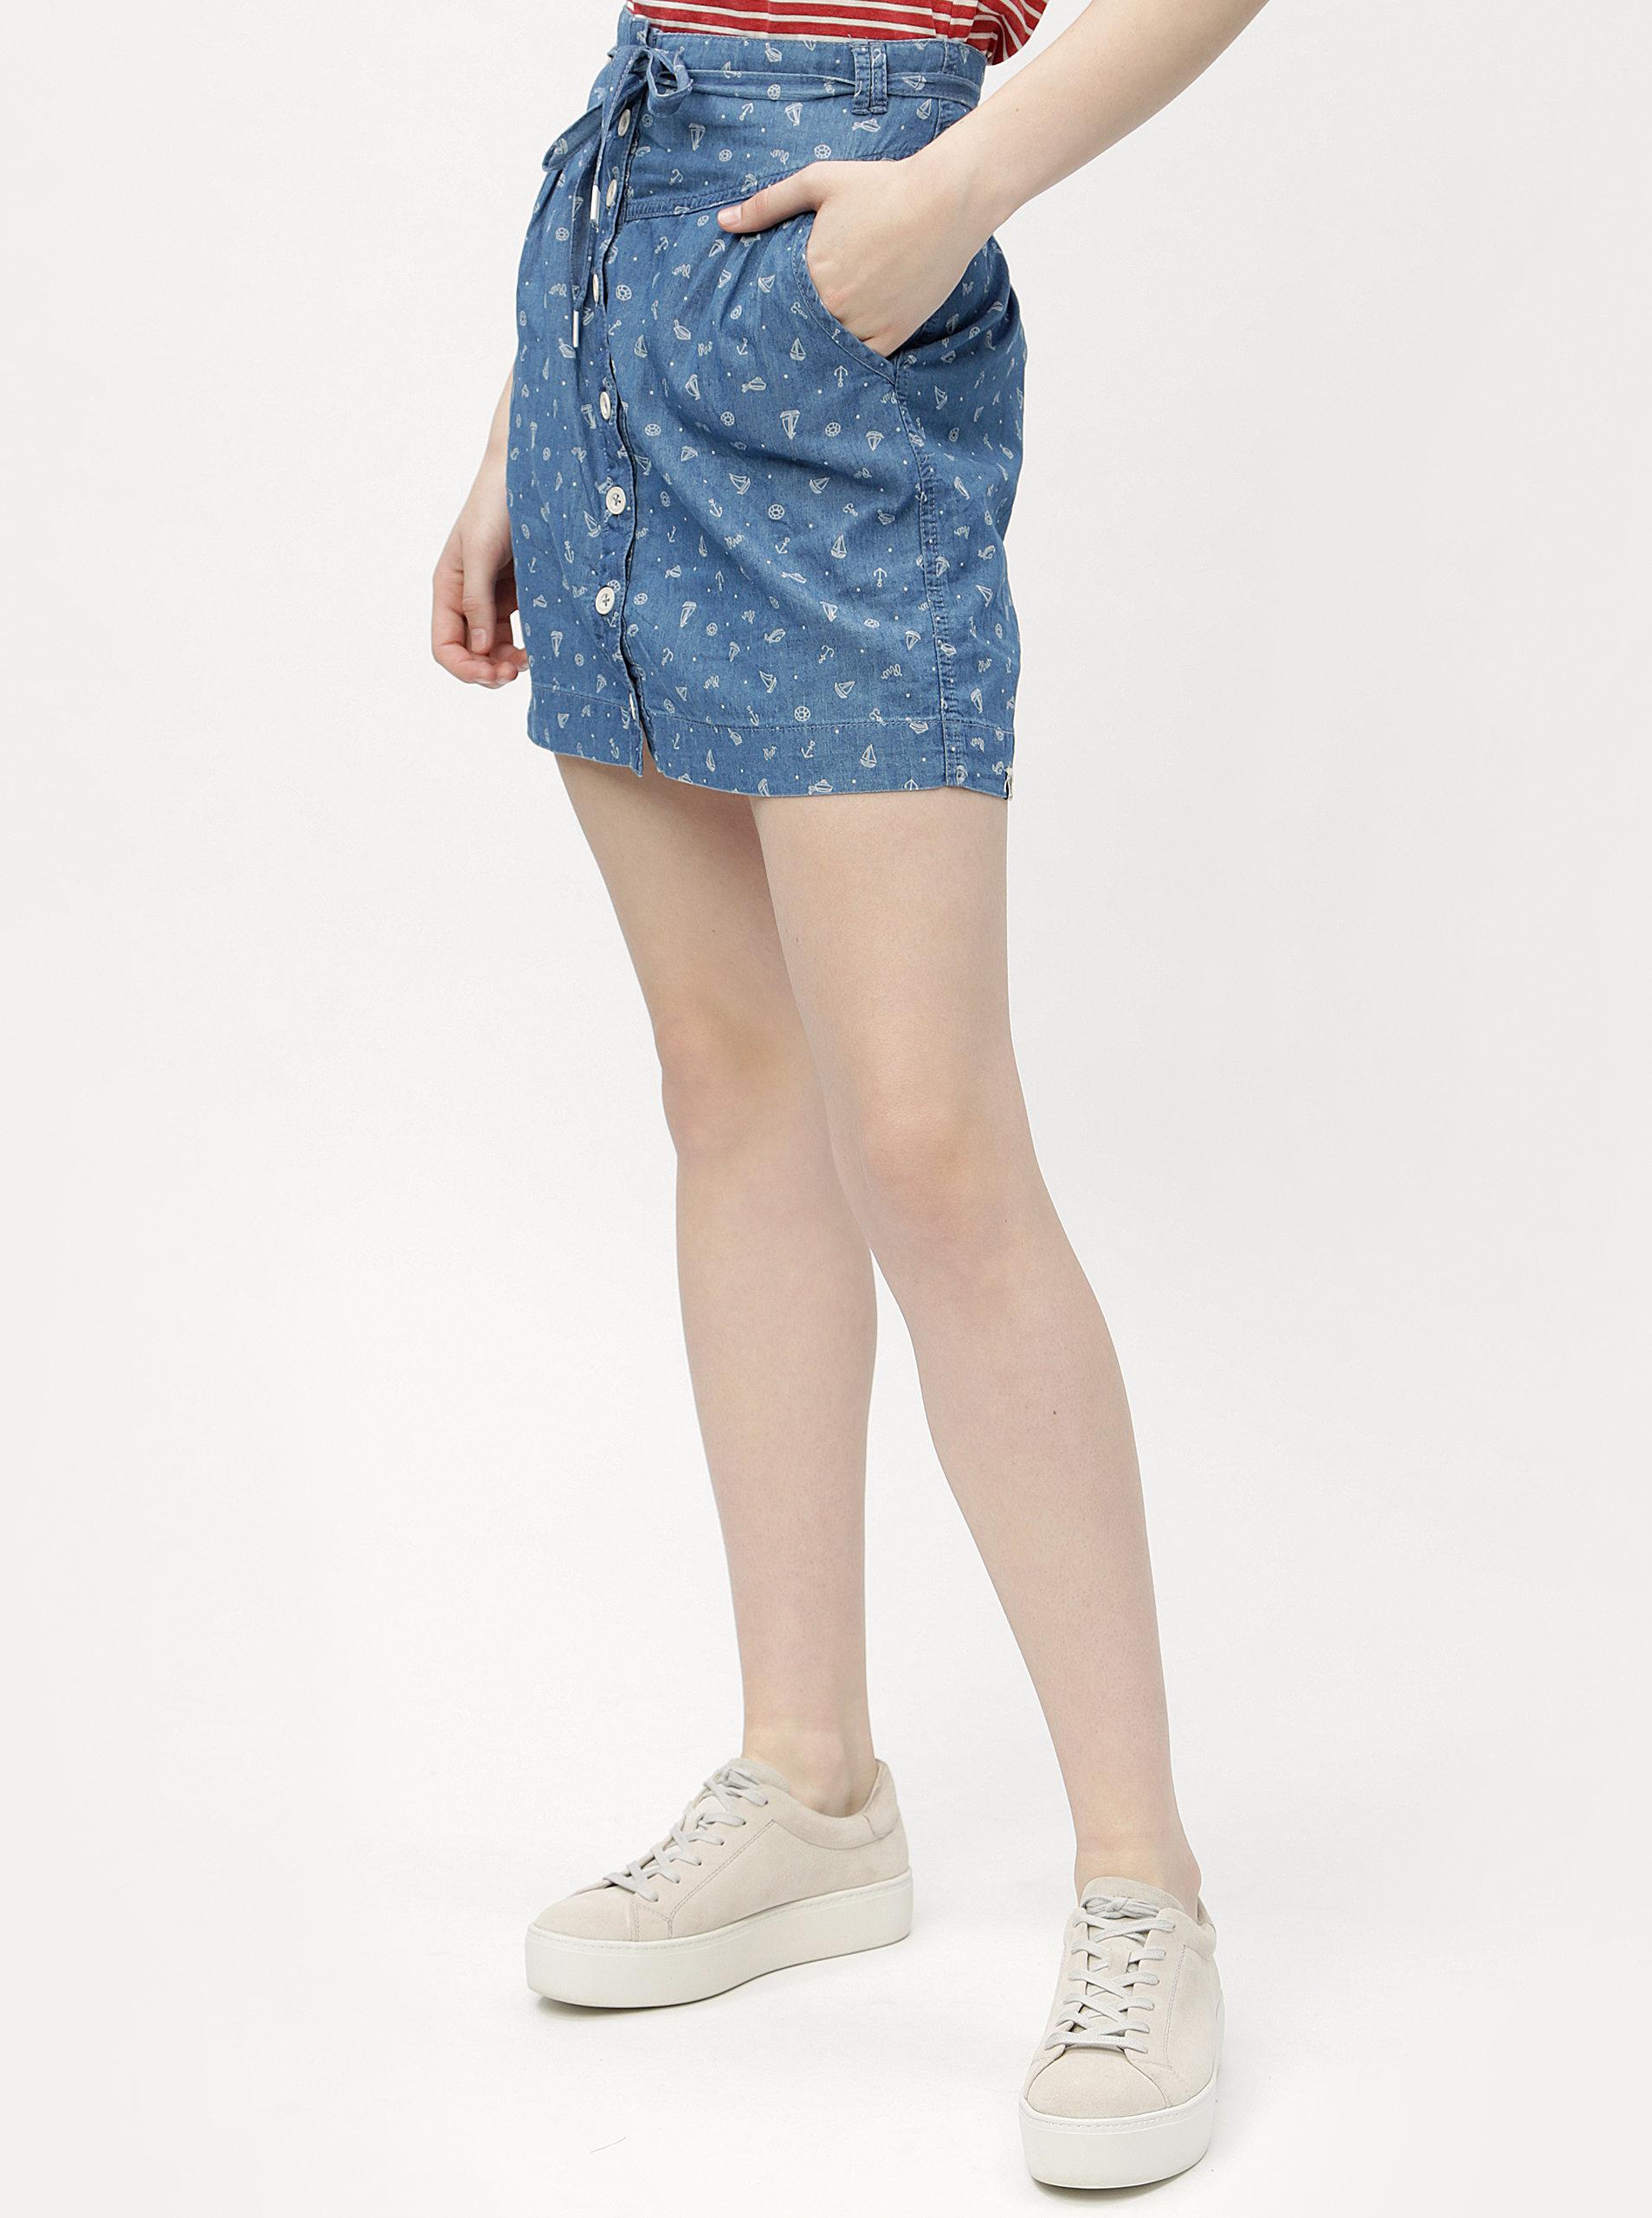 a5295fb6b4b7 Modrá sukňa s potlačou Ragwear Nina ...